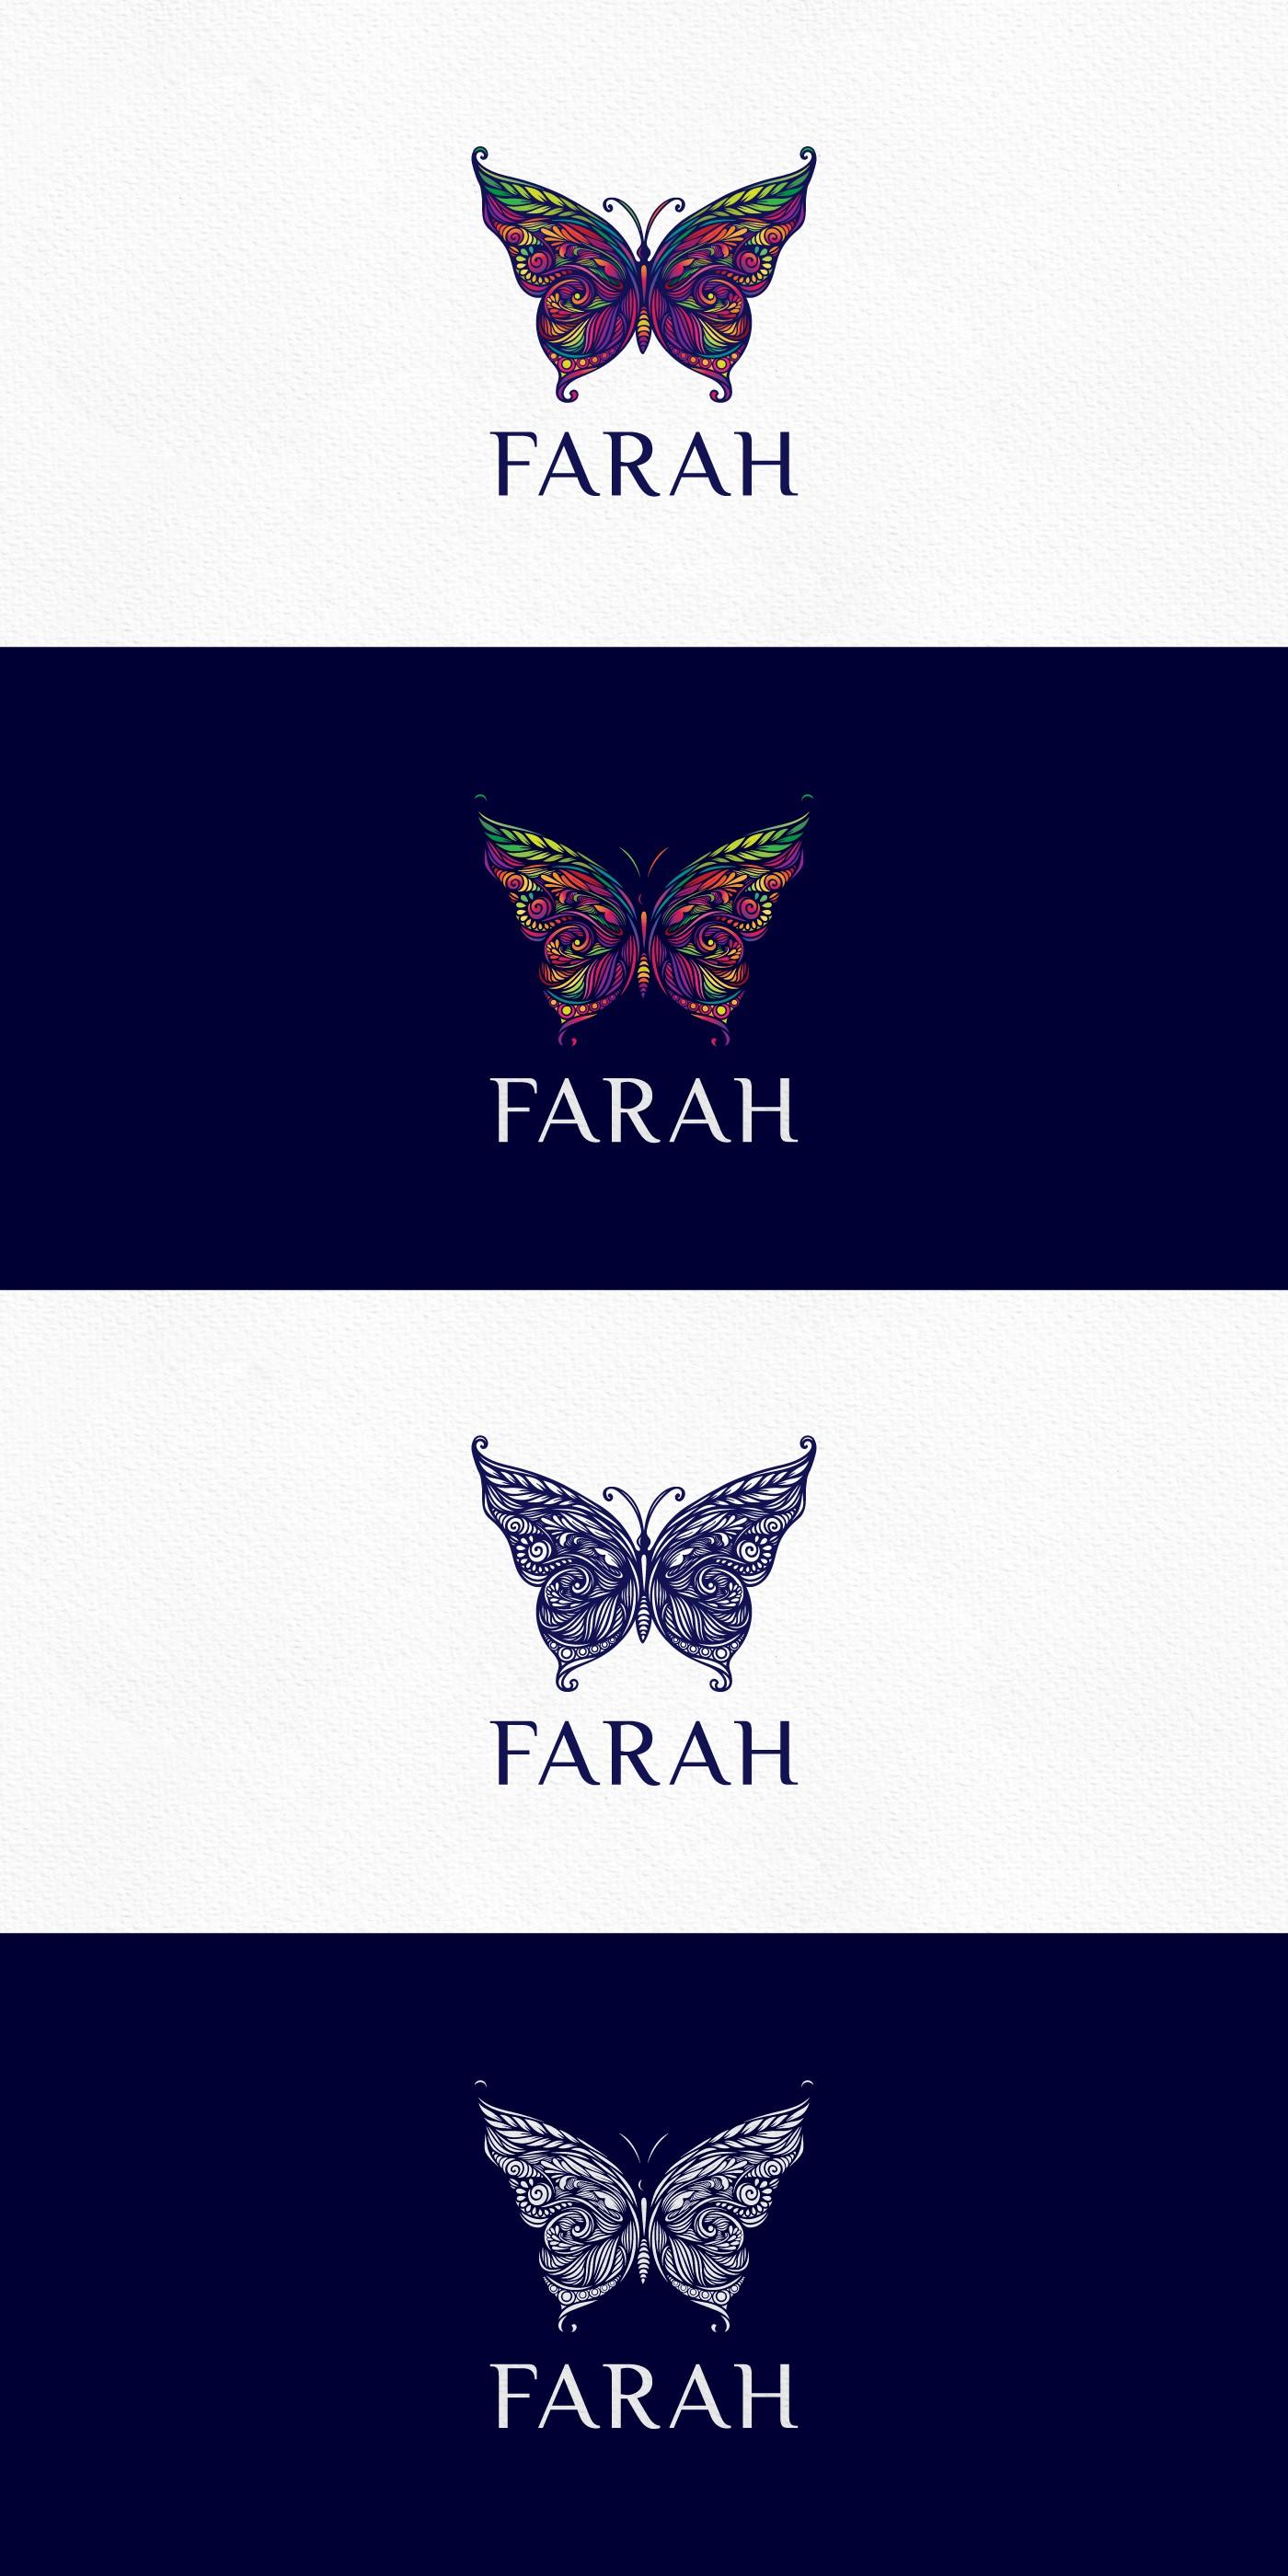 Farah Project